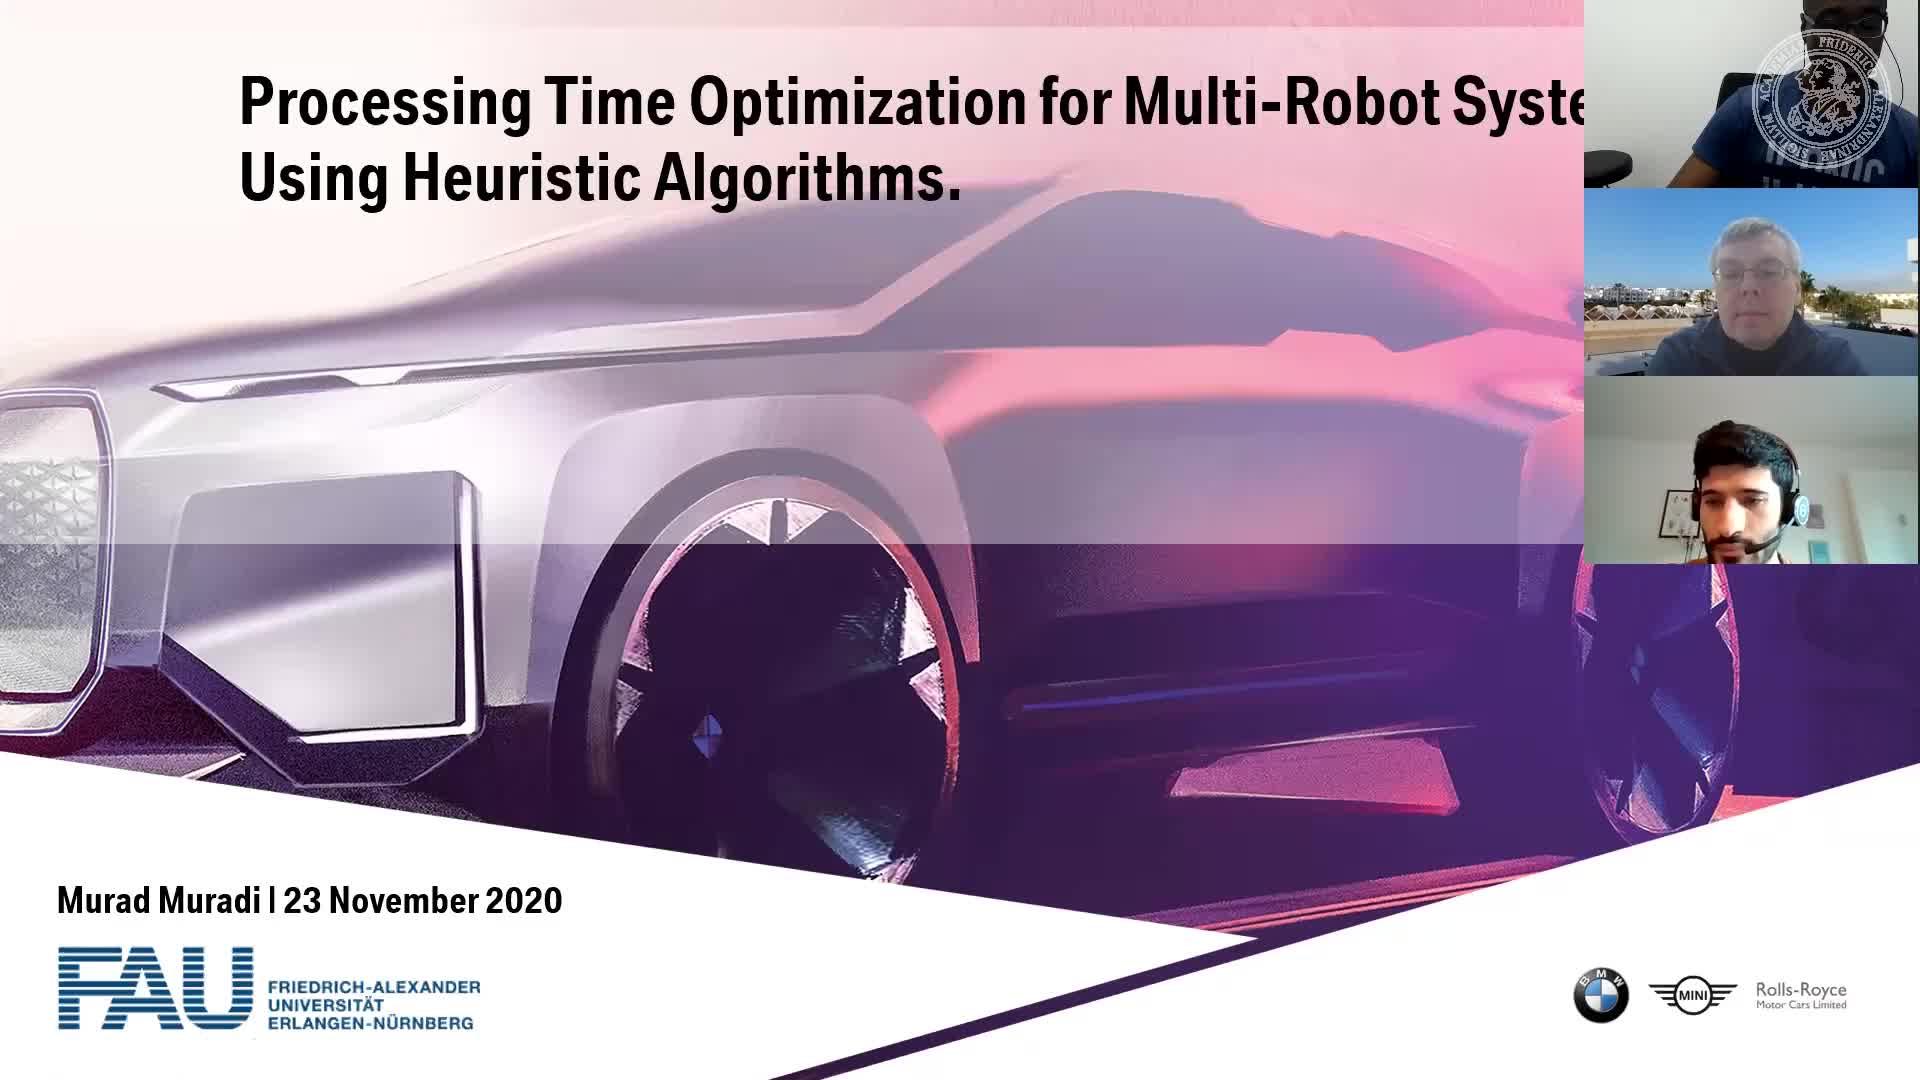 Processing Time Optimization for Multi-Robot Systems Using Heuristics Algorithms (Murad Muradi, FAU) preview image